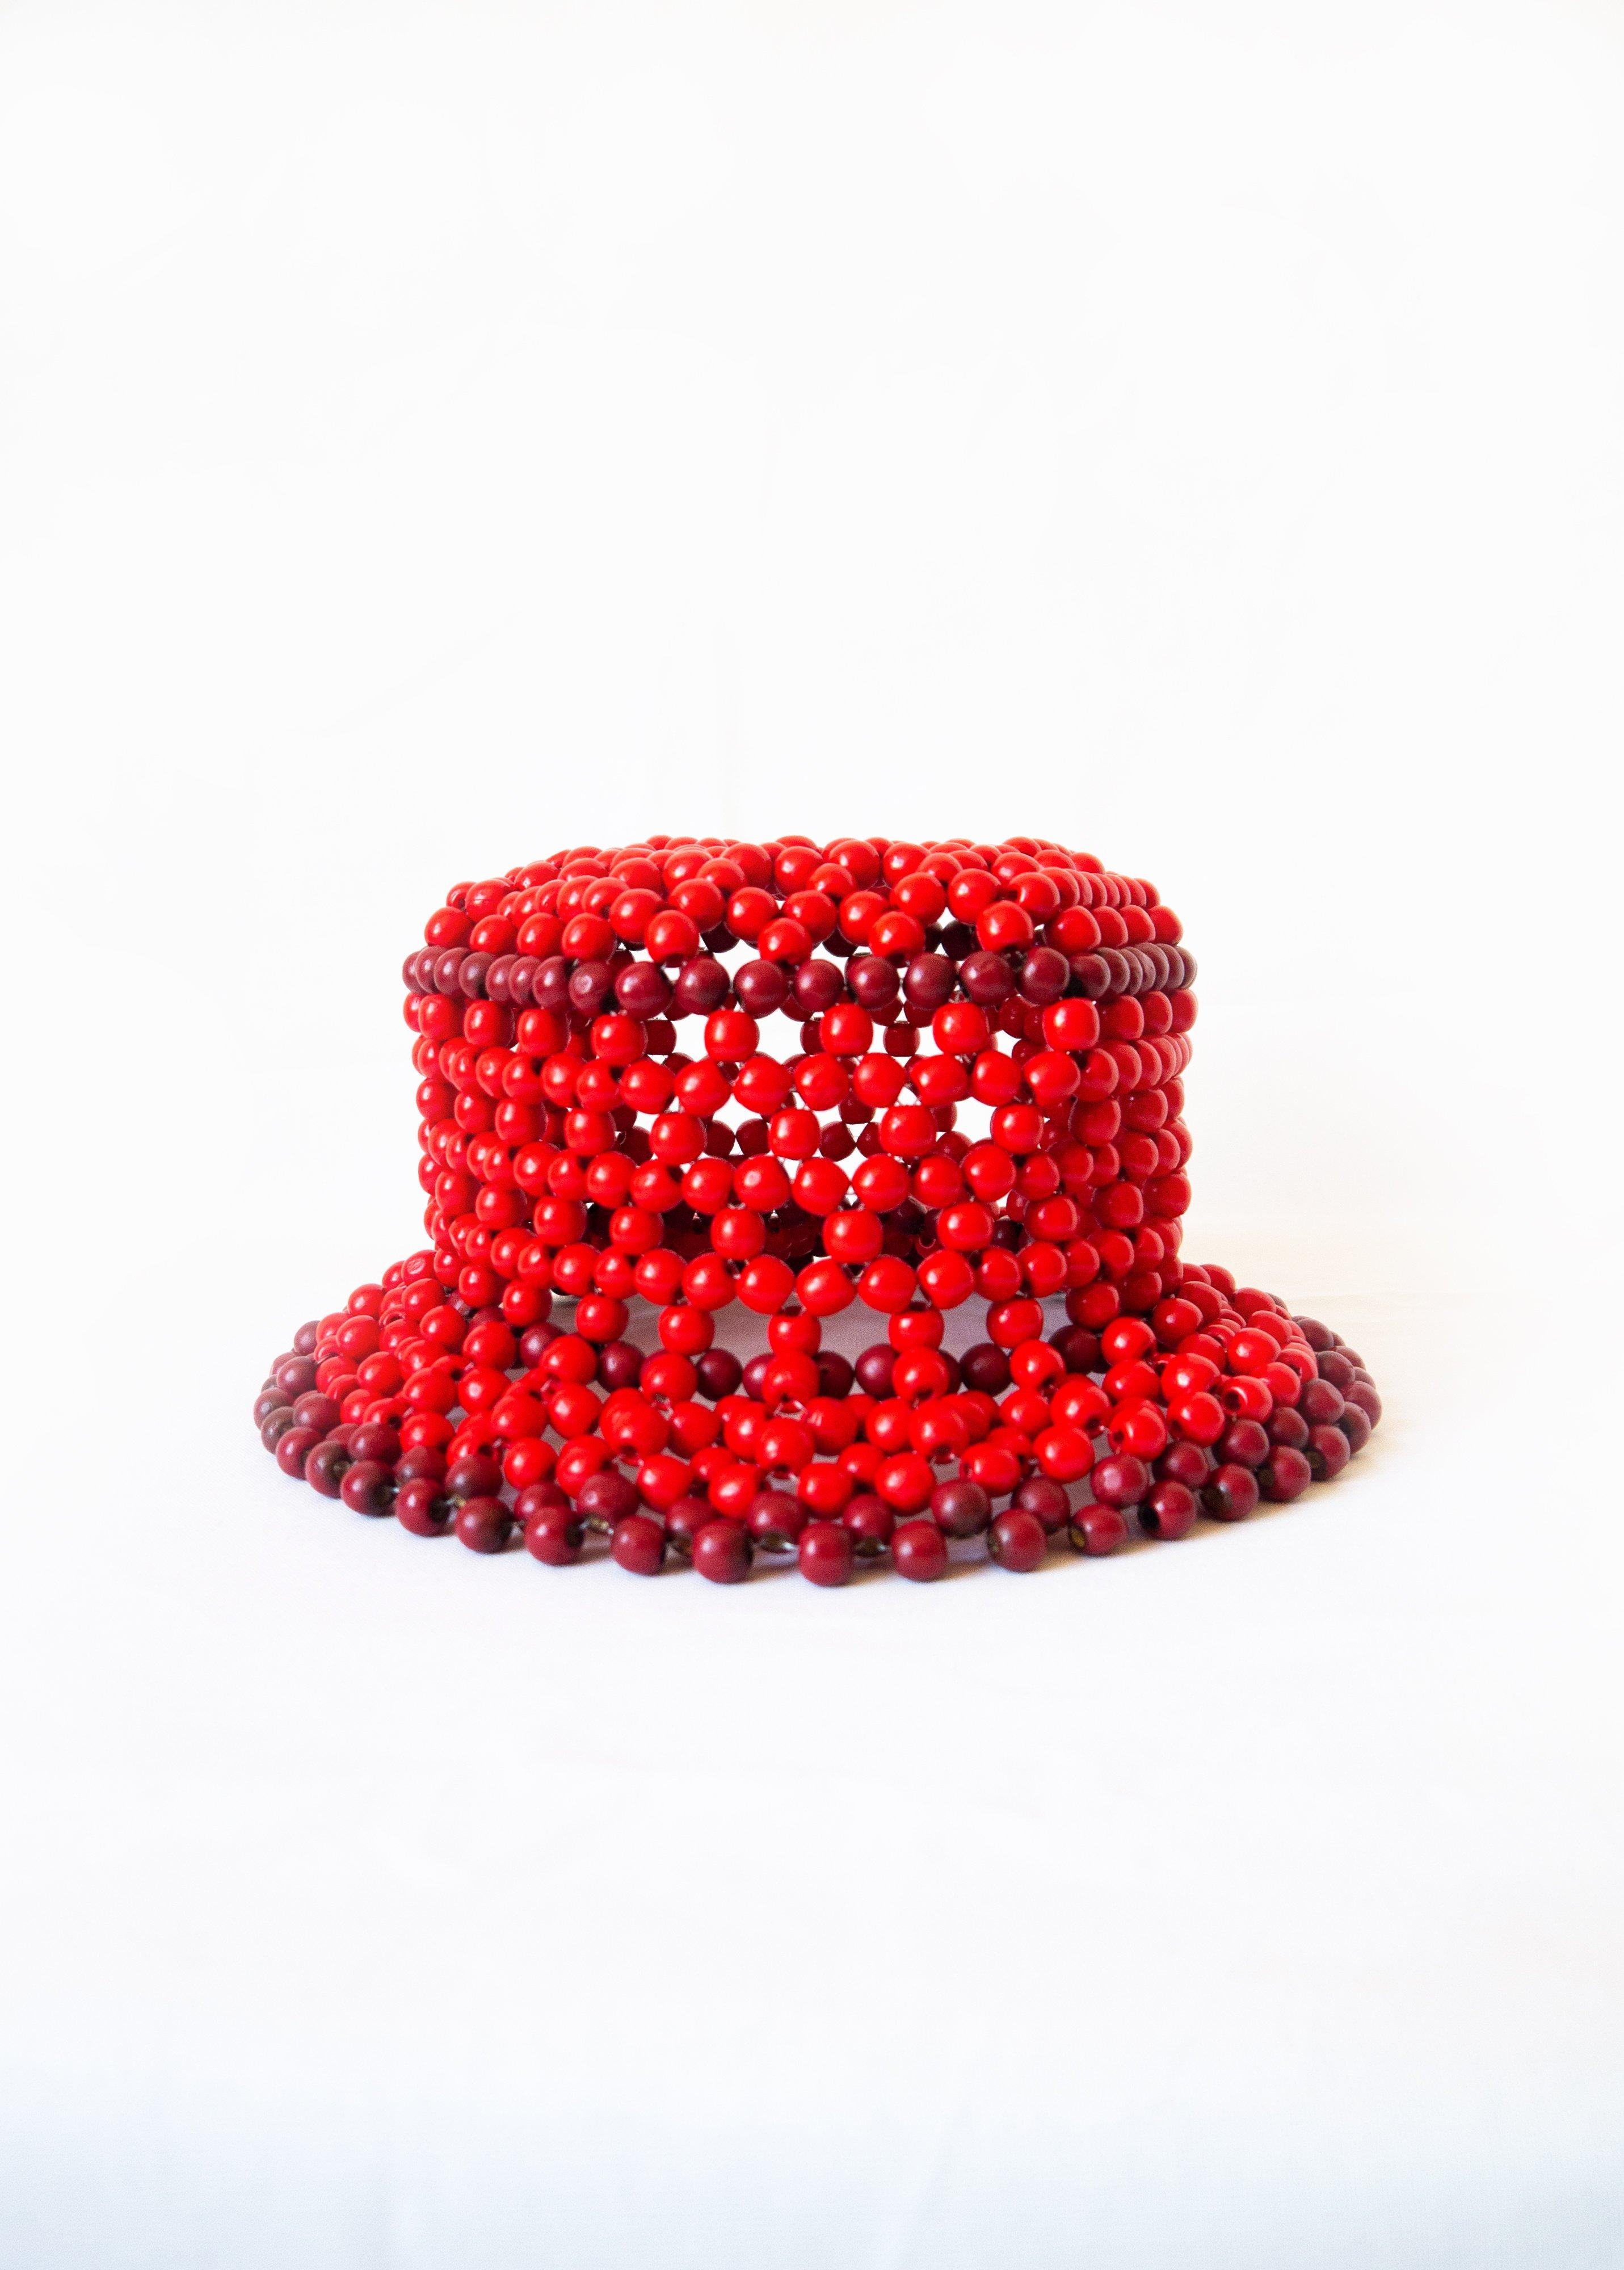 EDAS x Cameron Tea, Untitled, handmade beaded bucket hat